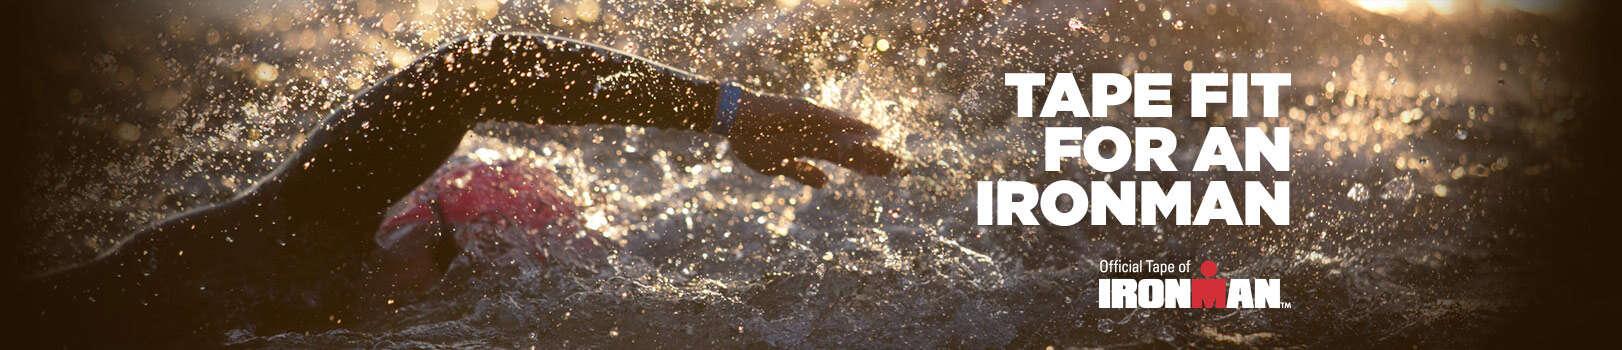 slider-ironman-official-swim-b9bae33d097193a98fbd6123c36e899f